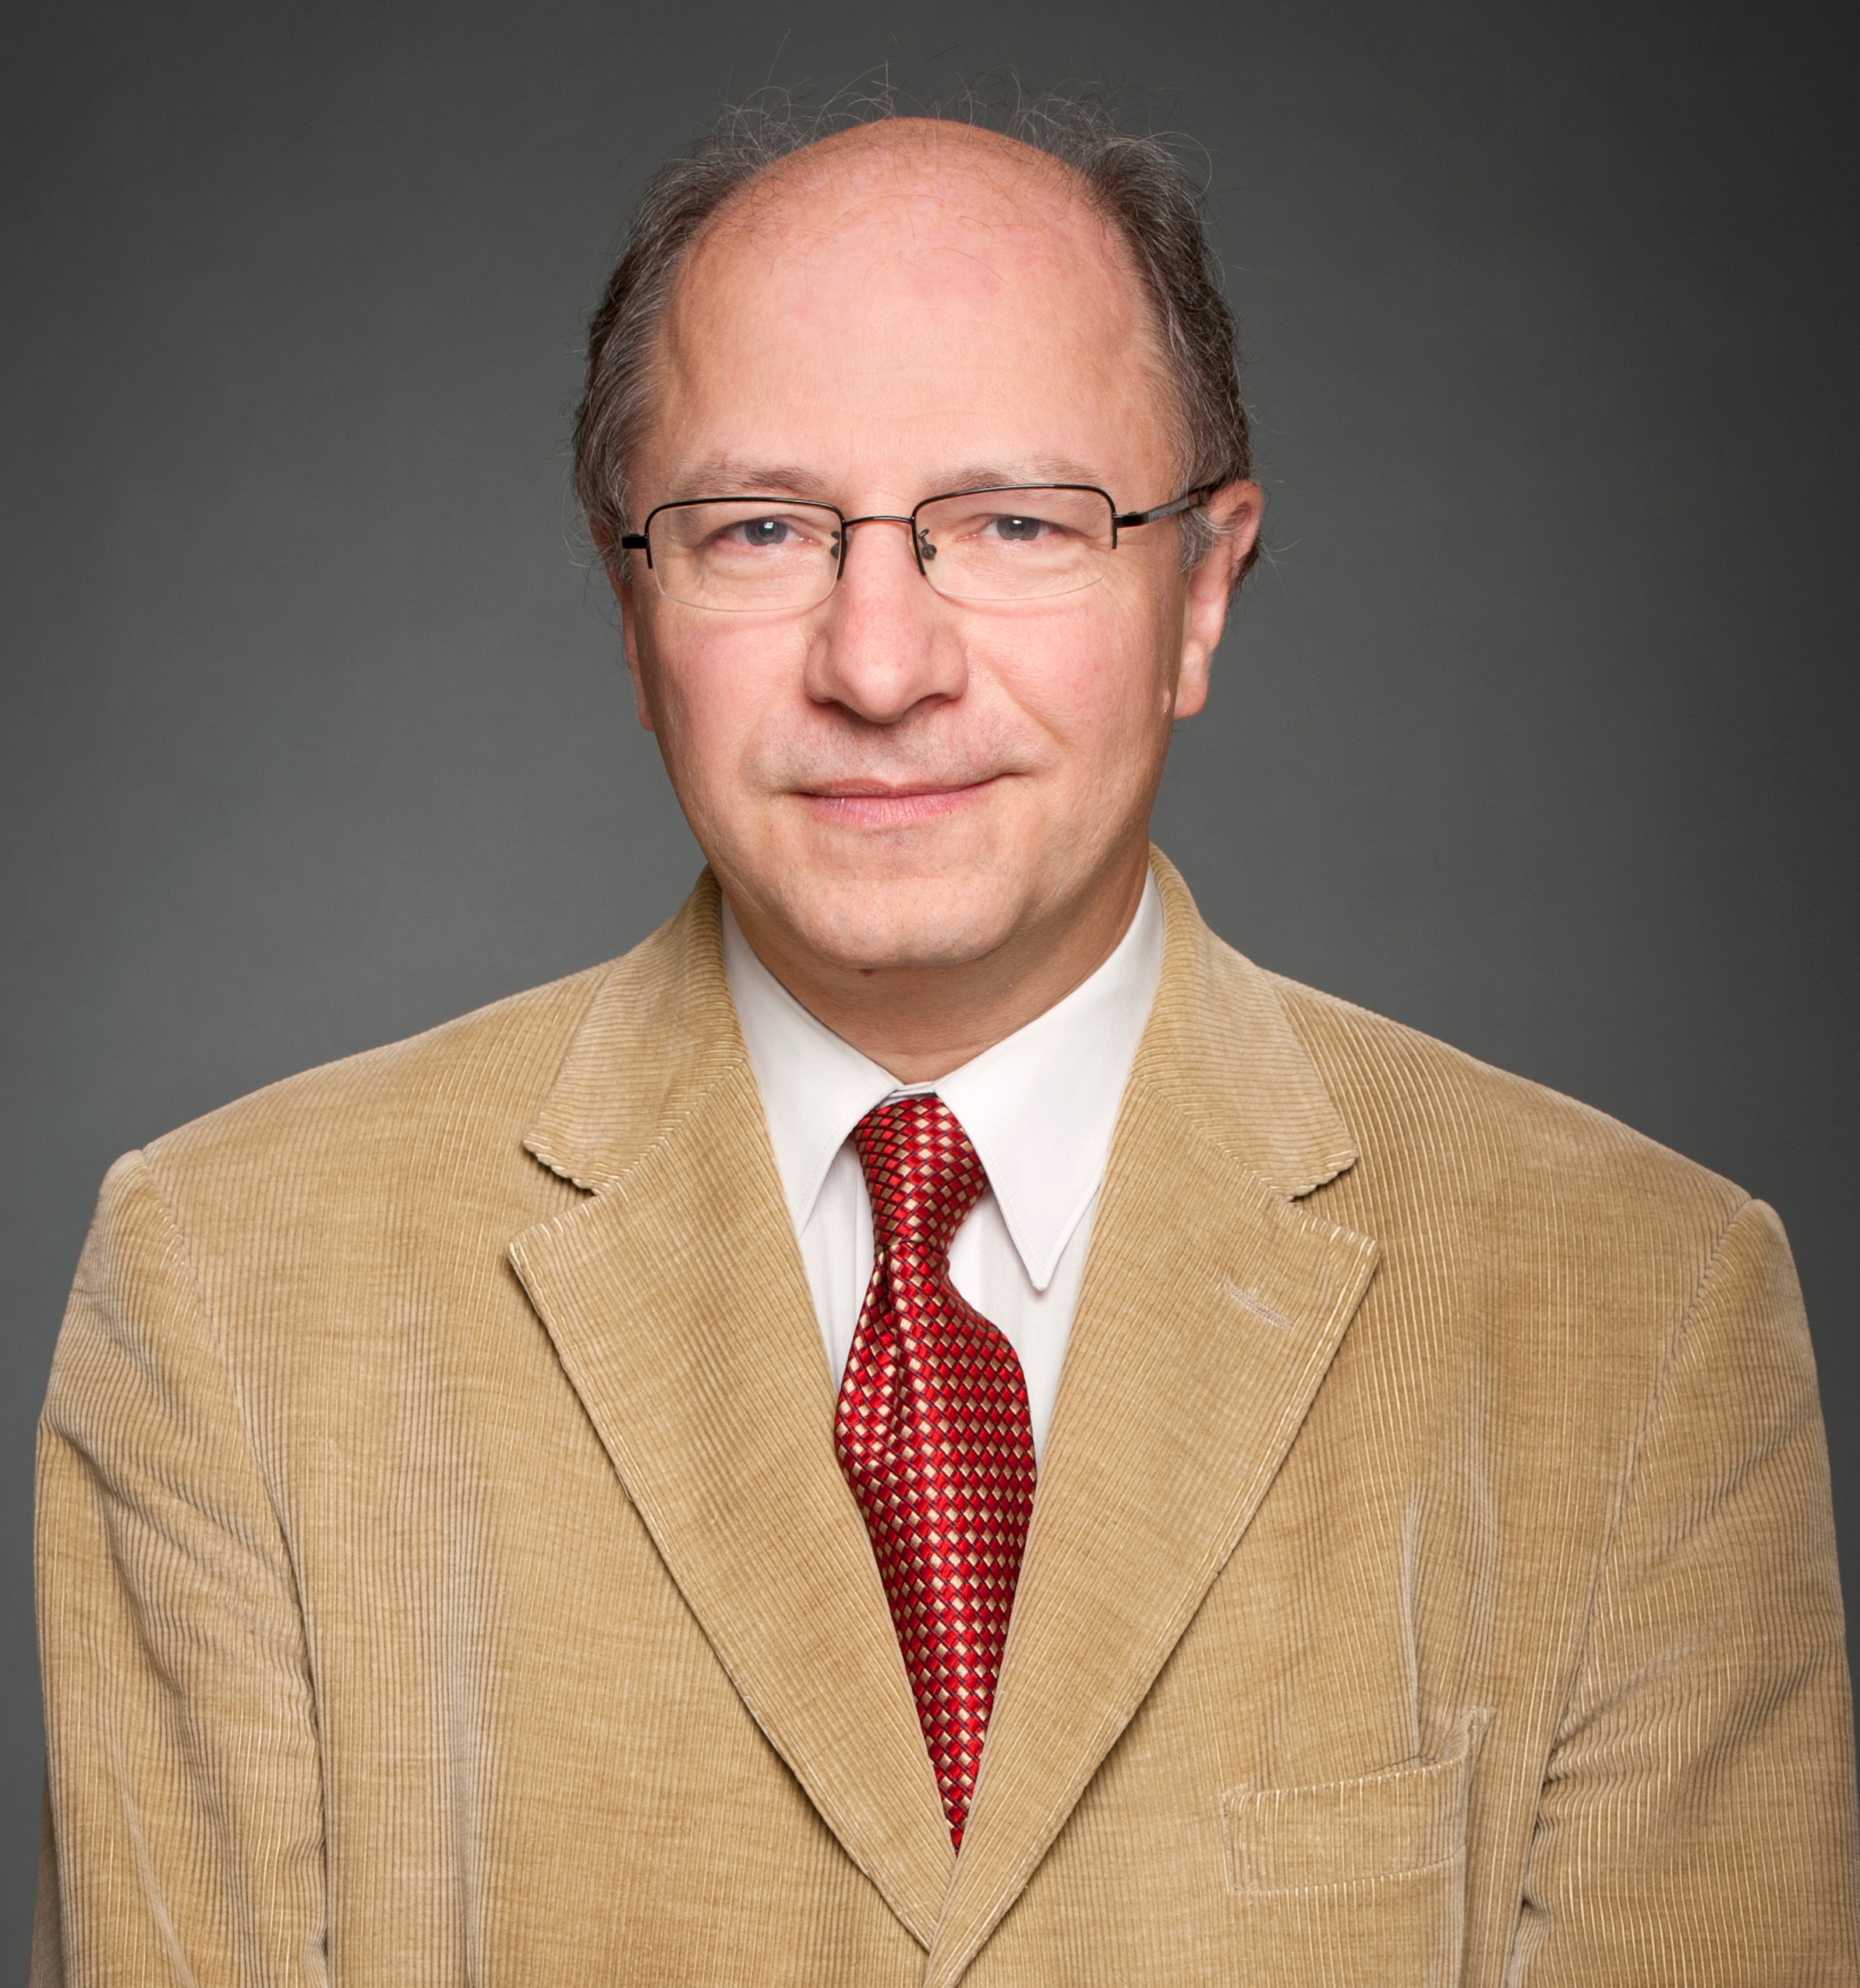 John Packer - Director, HRREC | Directeur, CREDP